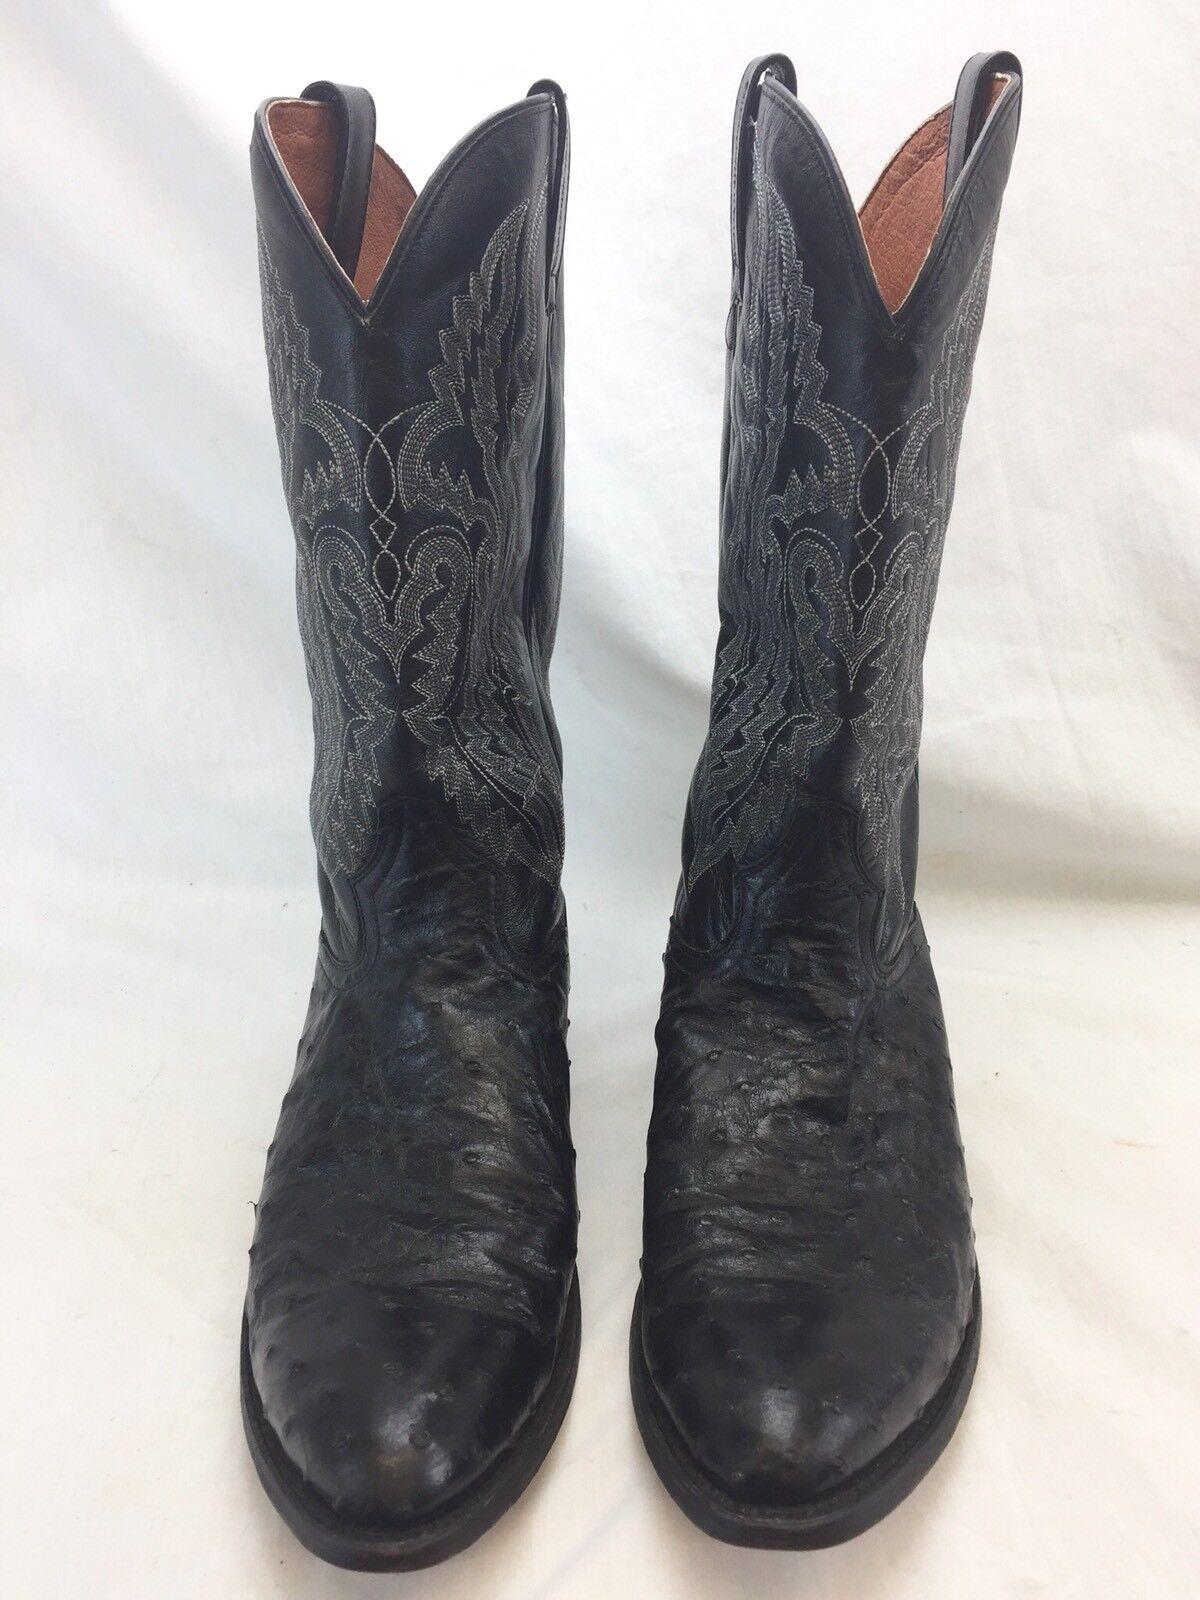 post  Herren dan post  schwarz ostrich Leder western cowboy Stiefel Größe 11 1/2 D 2310 1d640a